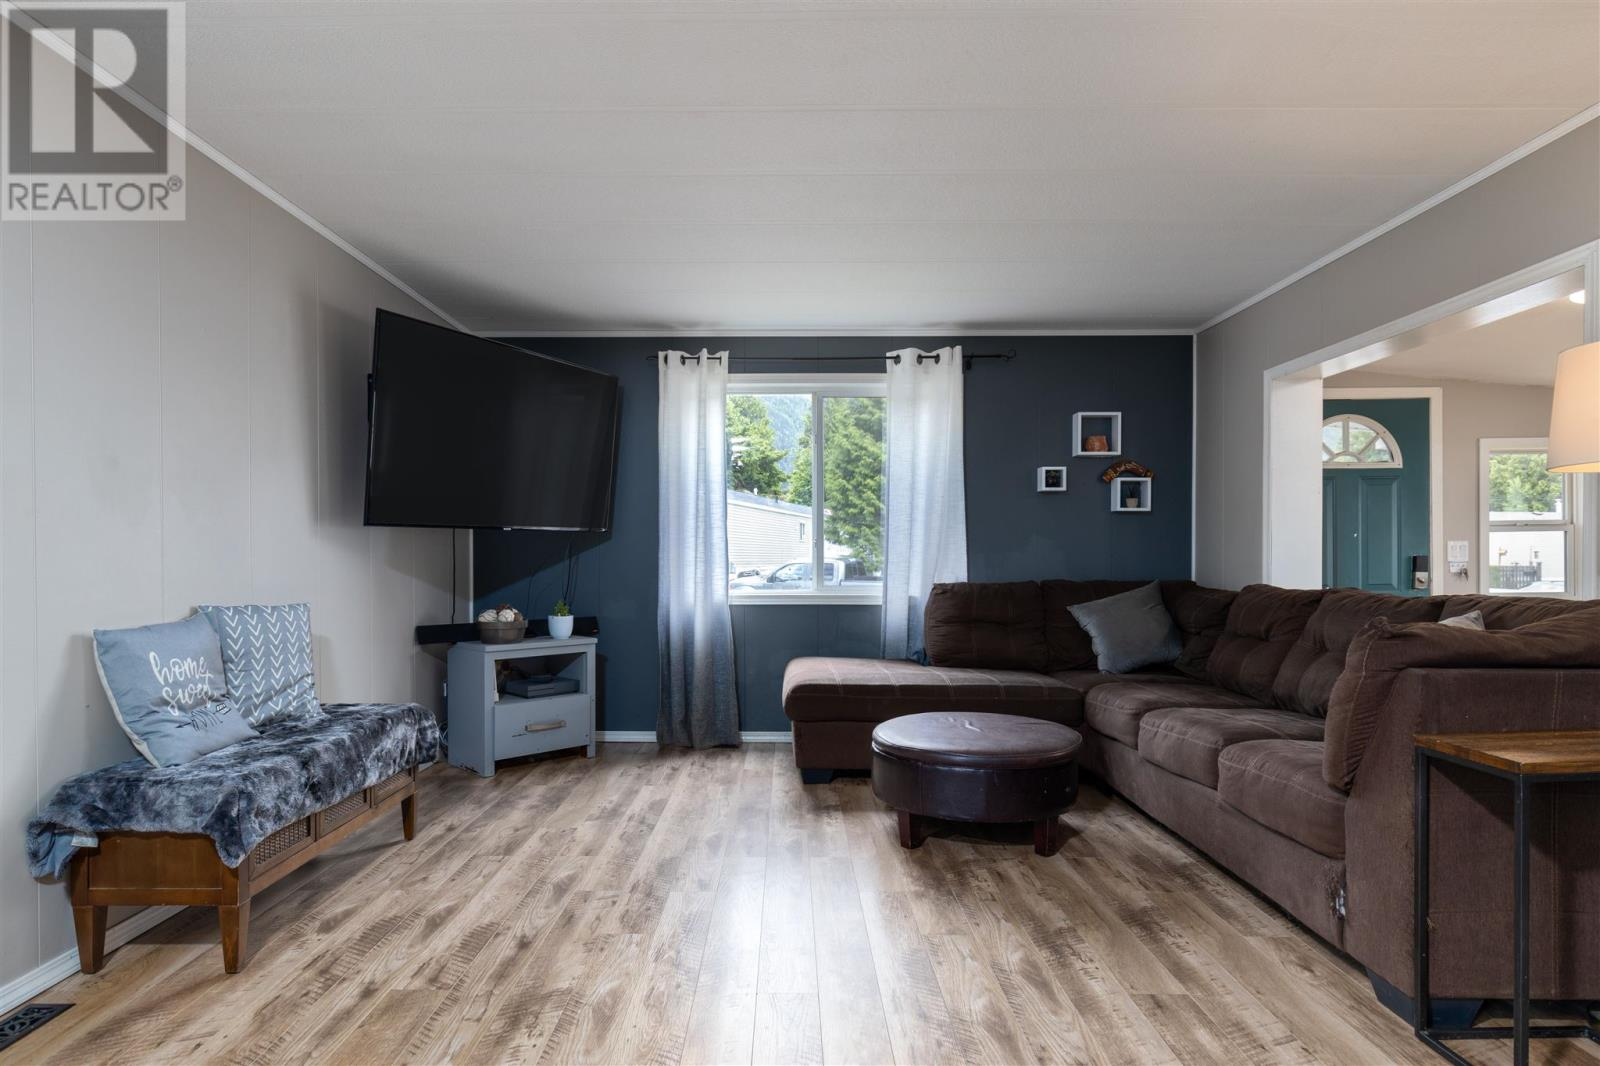 52 3616 Larch Avenue, Terrace, British Columbia  V8G 5B9 - Photo 4 - R2594554